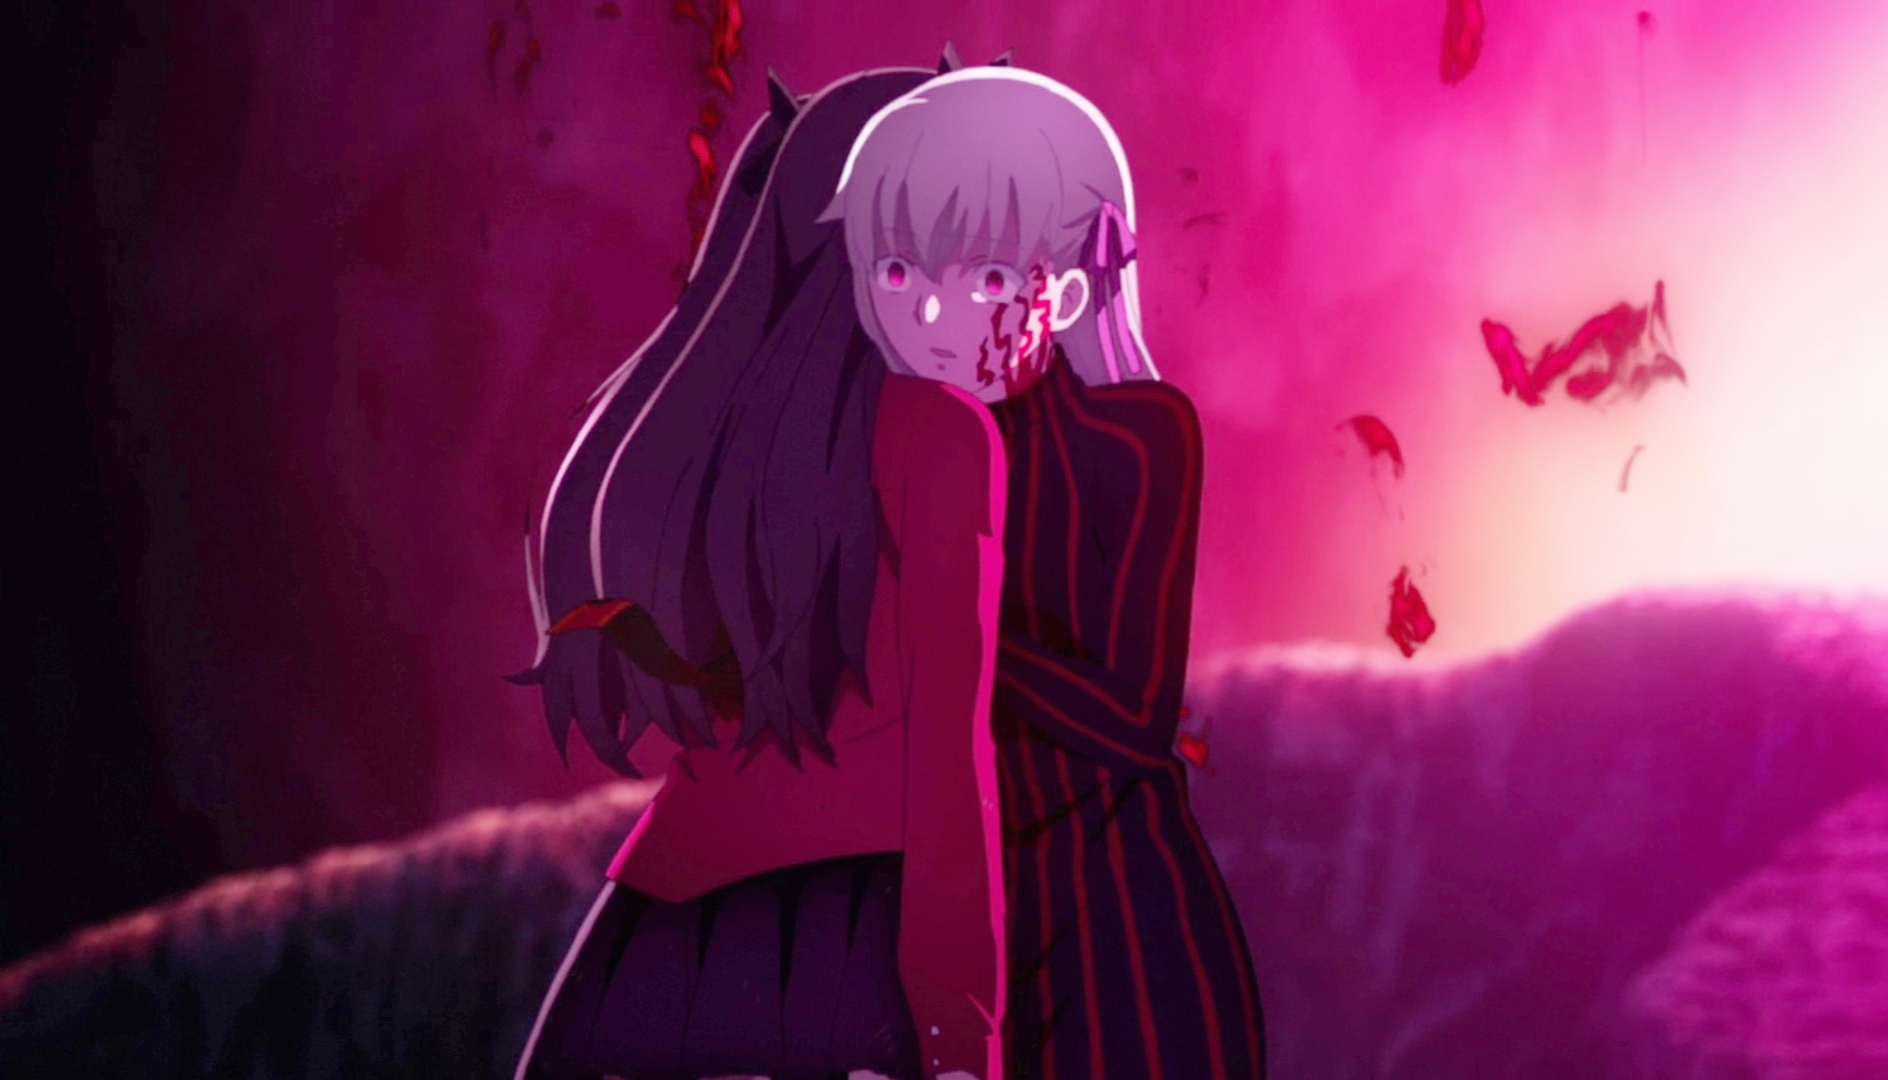 《fate》HF春之歌落幕,巔峰特效背後,小櫻獲得最後的幸福